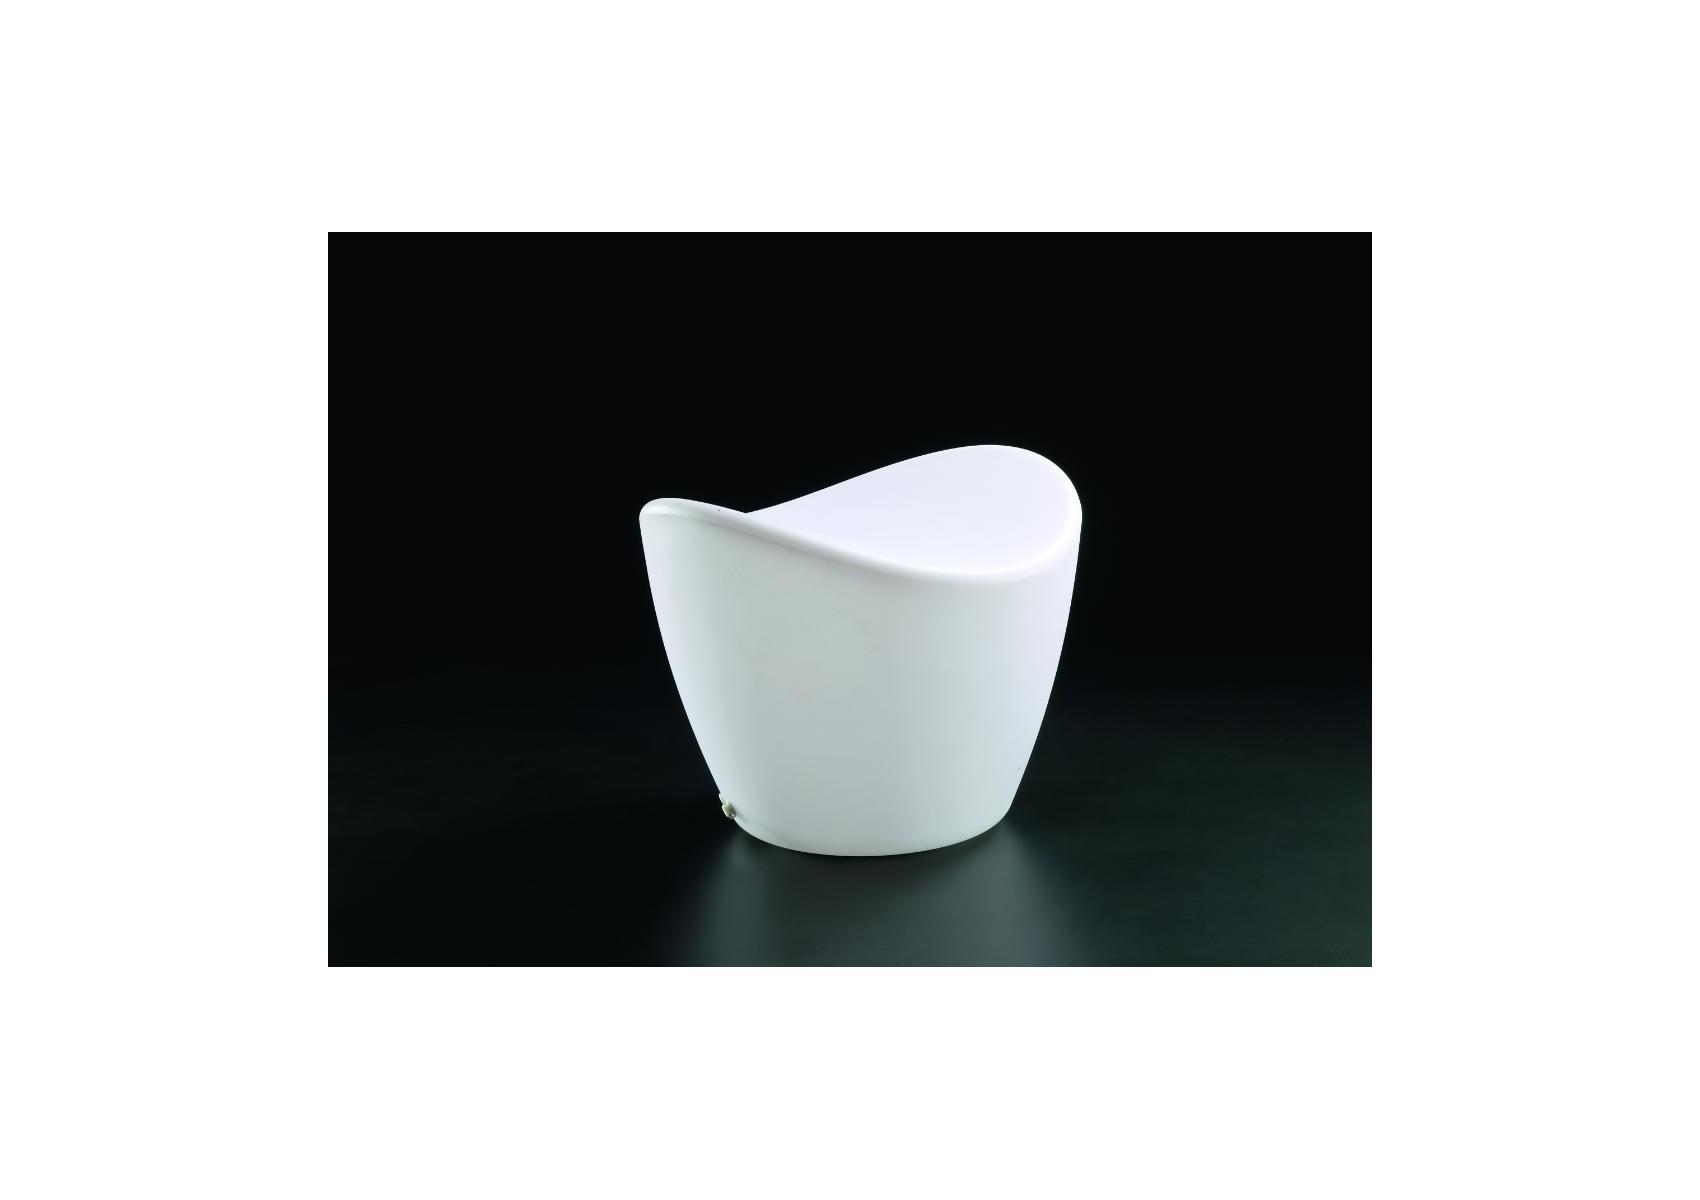 pouf cool ext rieur lumineux rgb ip65 mantra boite design. Black Bedroom Furniture Sets. Home Design Ideas